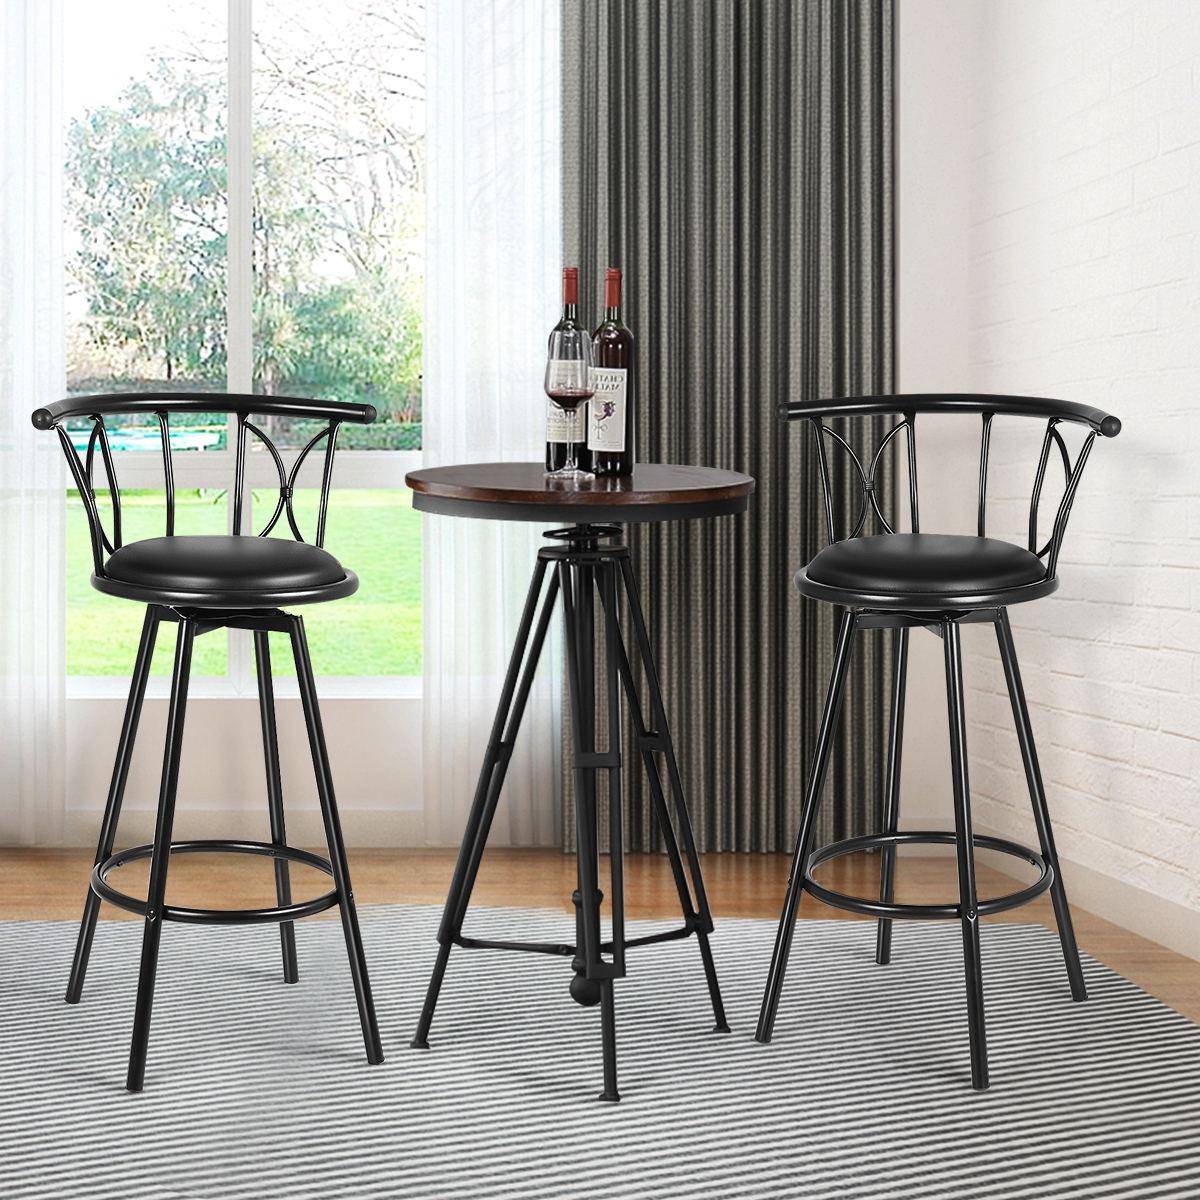 Set of 2 Swivel Bar stools Rotatable Chairs